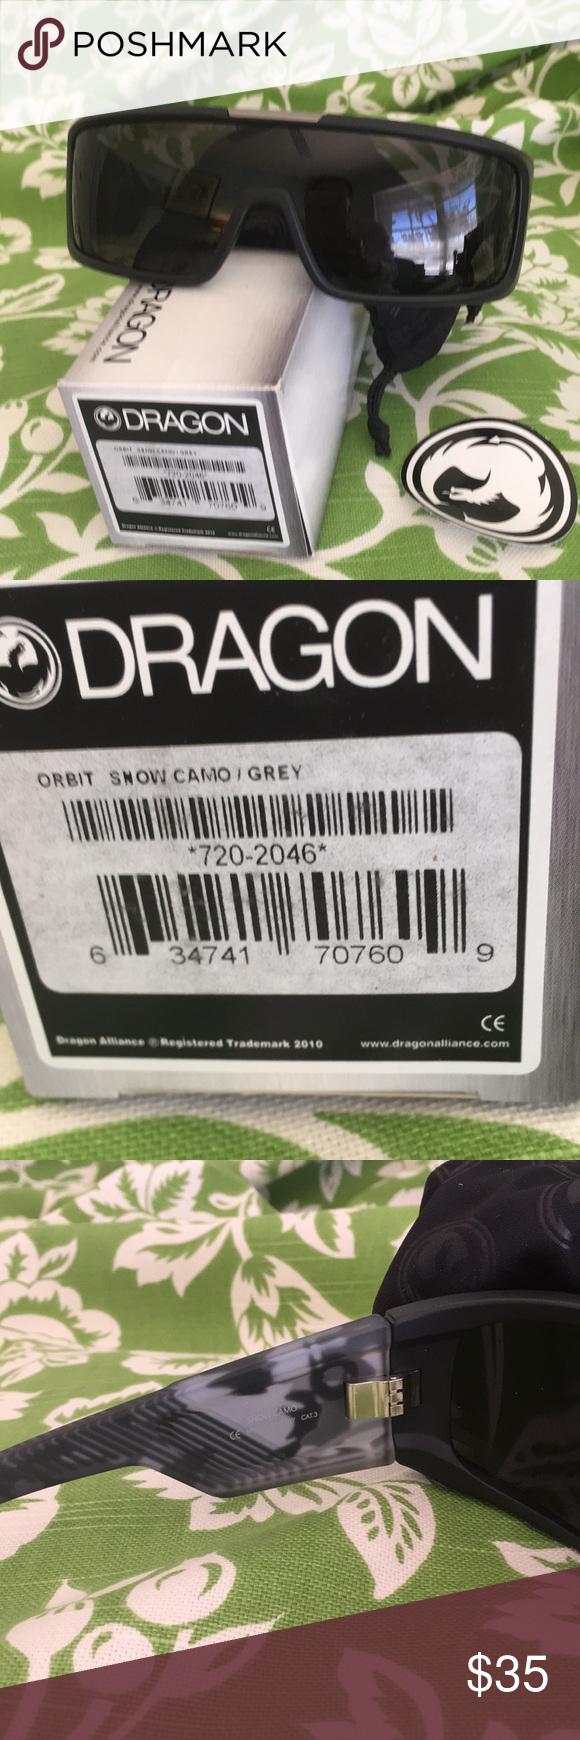 00b9a0b02c4d NWT Dragon Orbit snow camp grey sunglasses NWT Dragon Orbit snow camp grey  sunglasses fast shipper